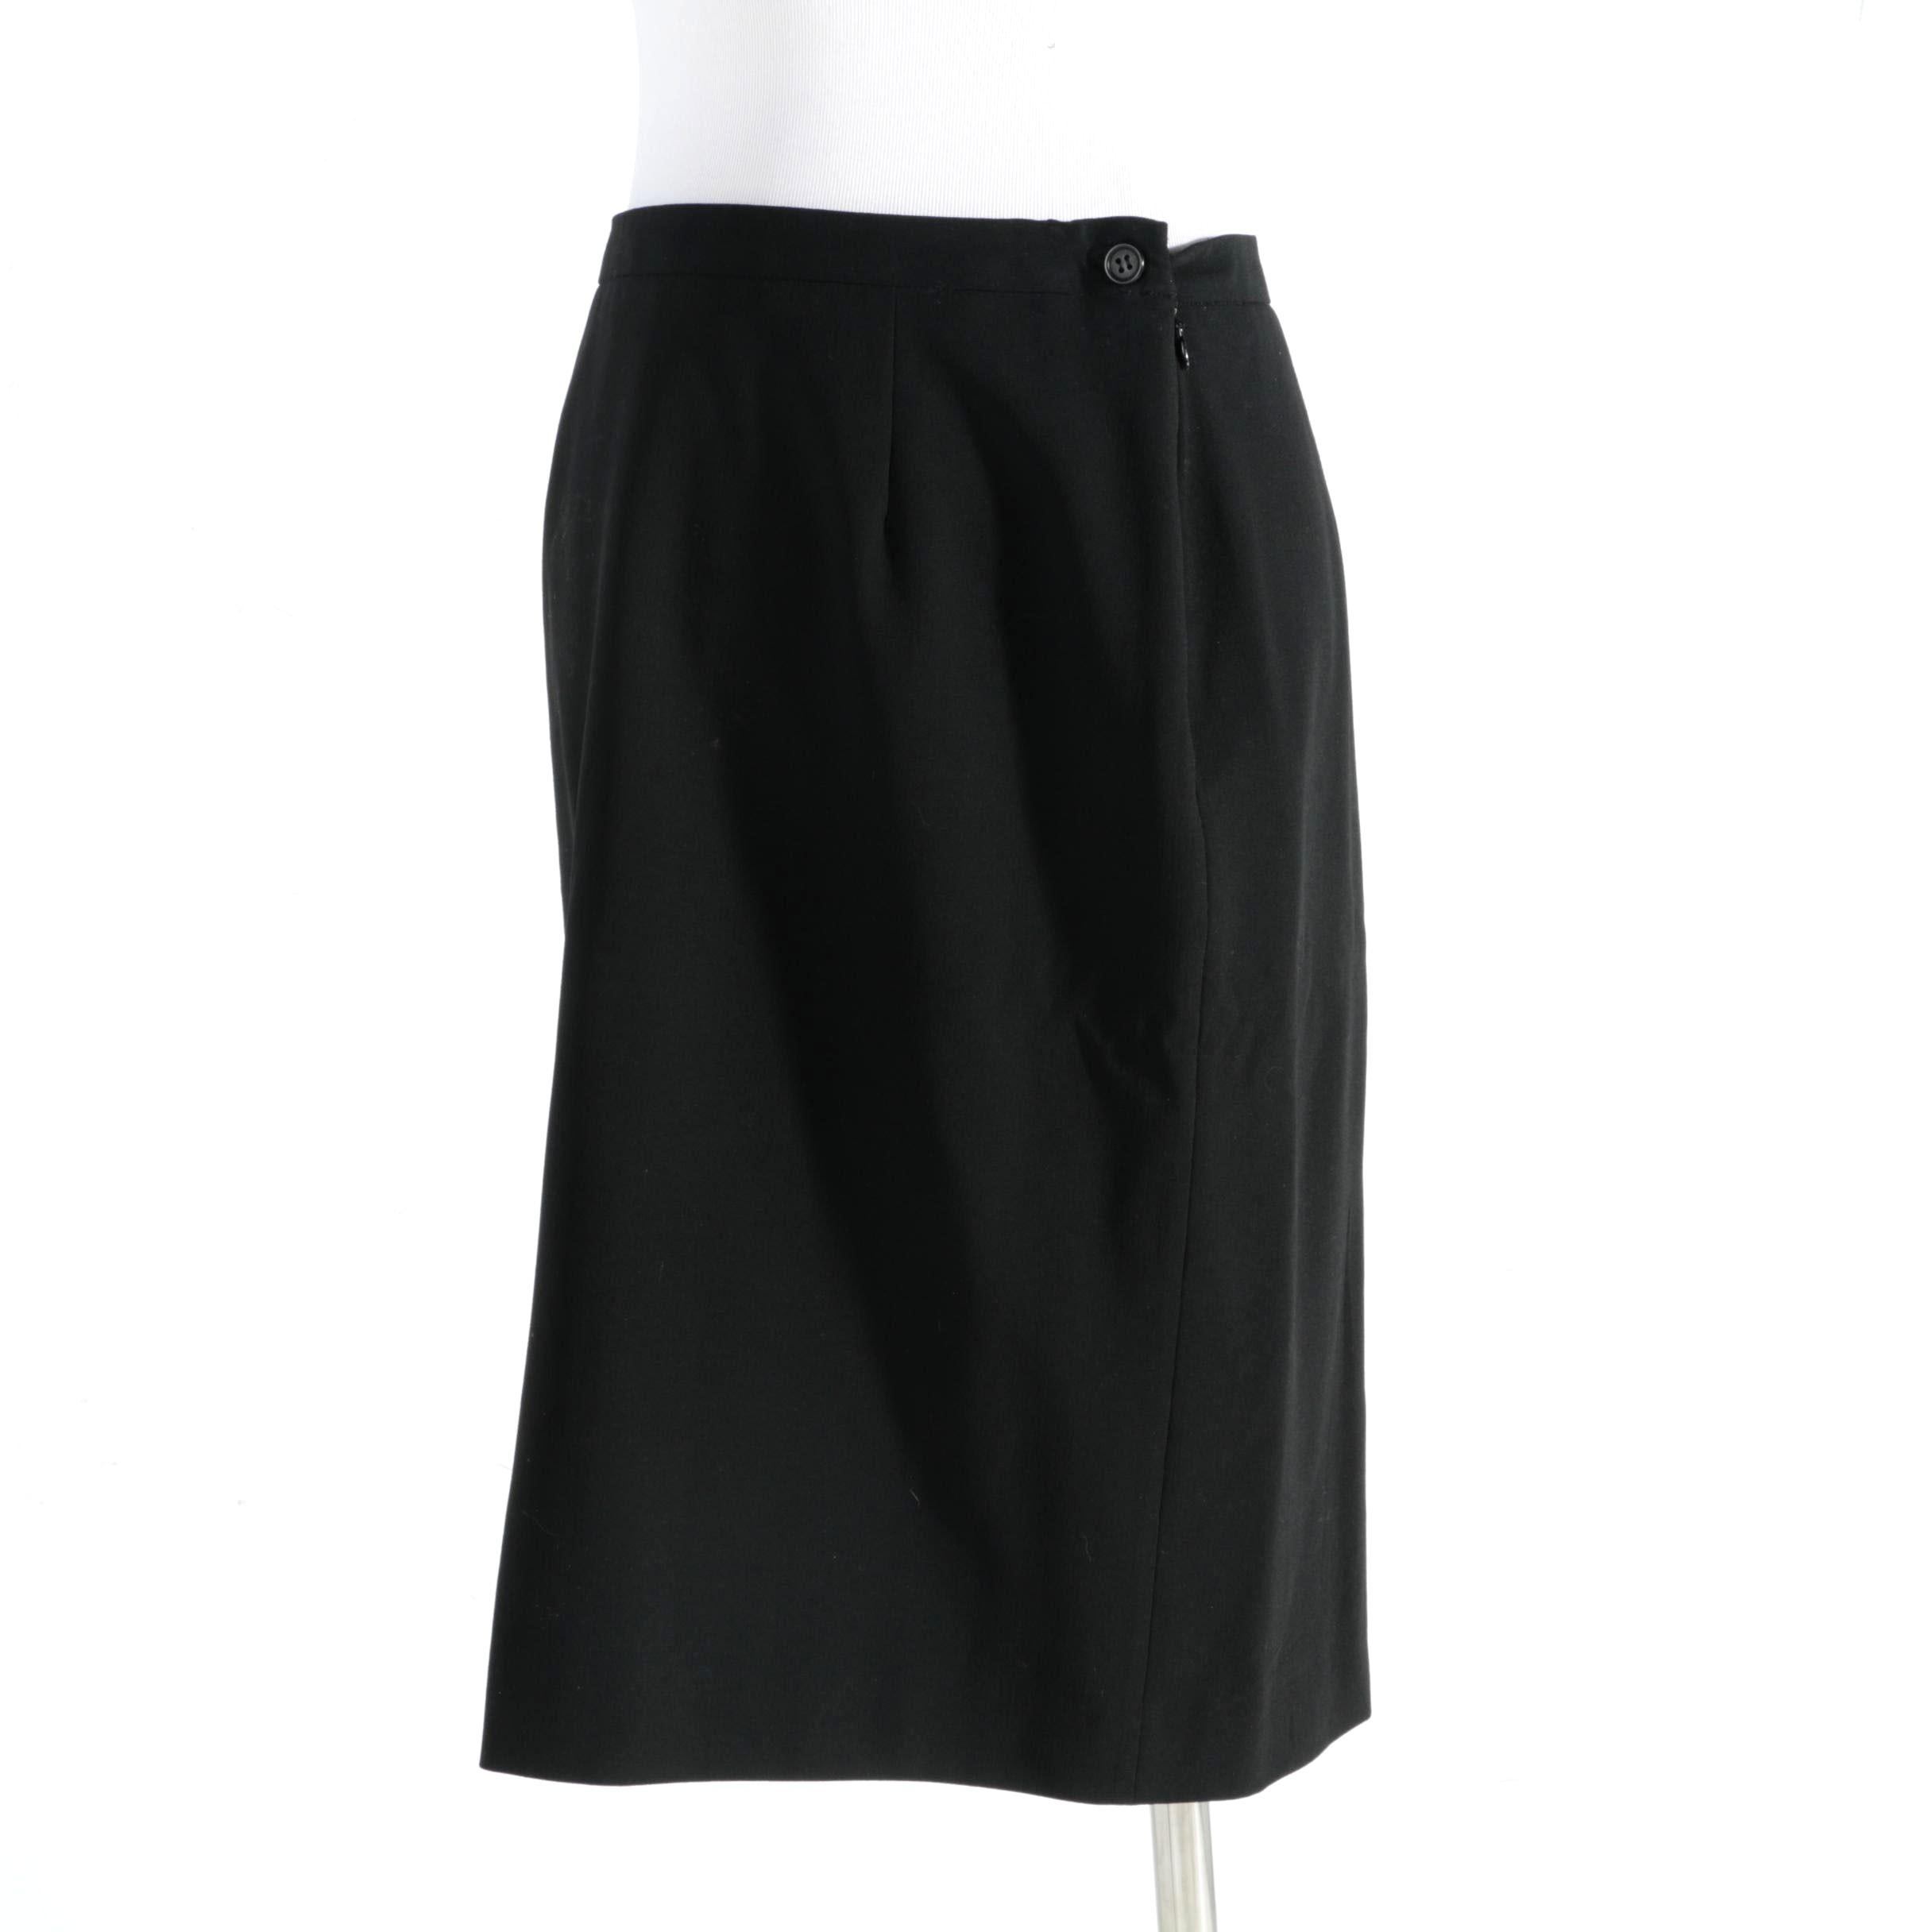 Giorgio Armani Black Wool Skirt